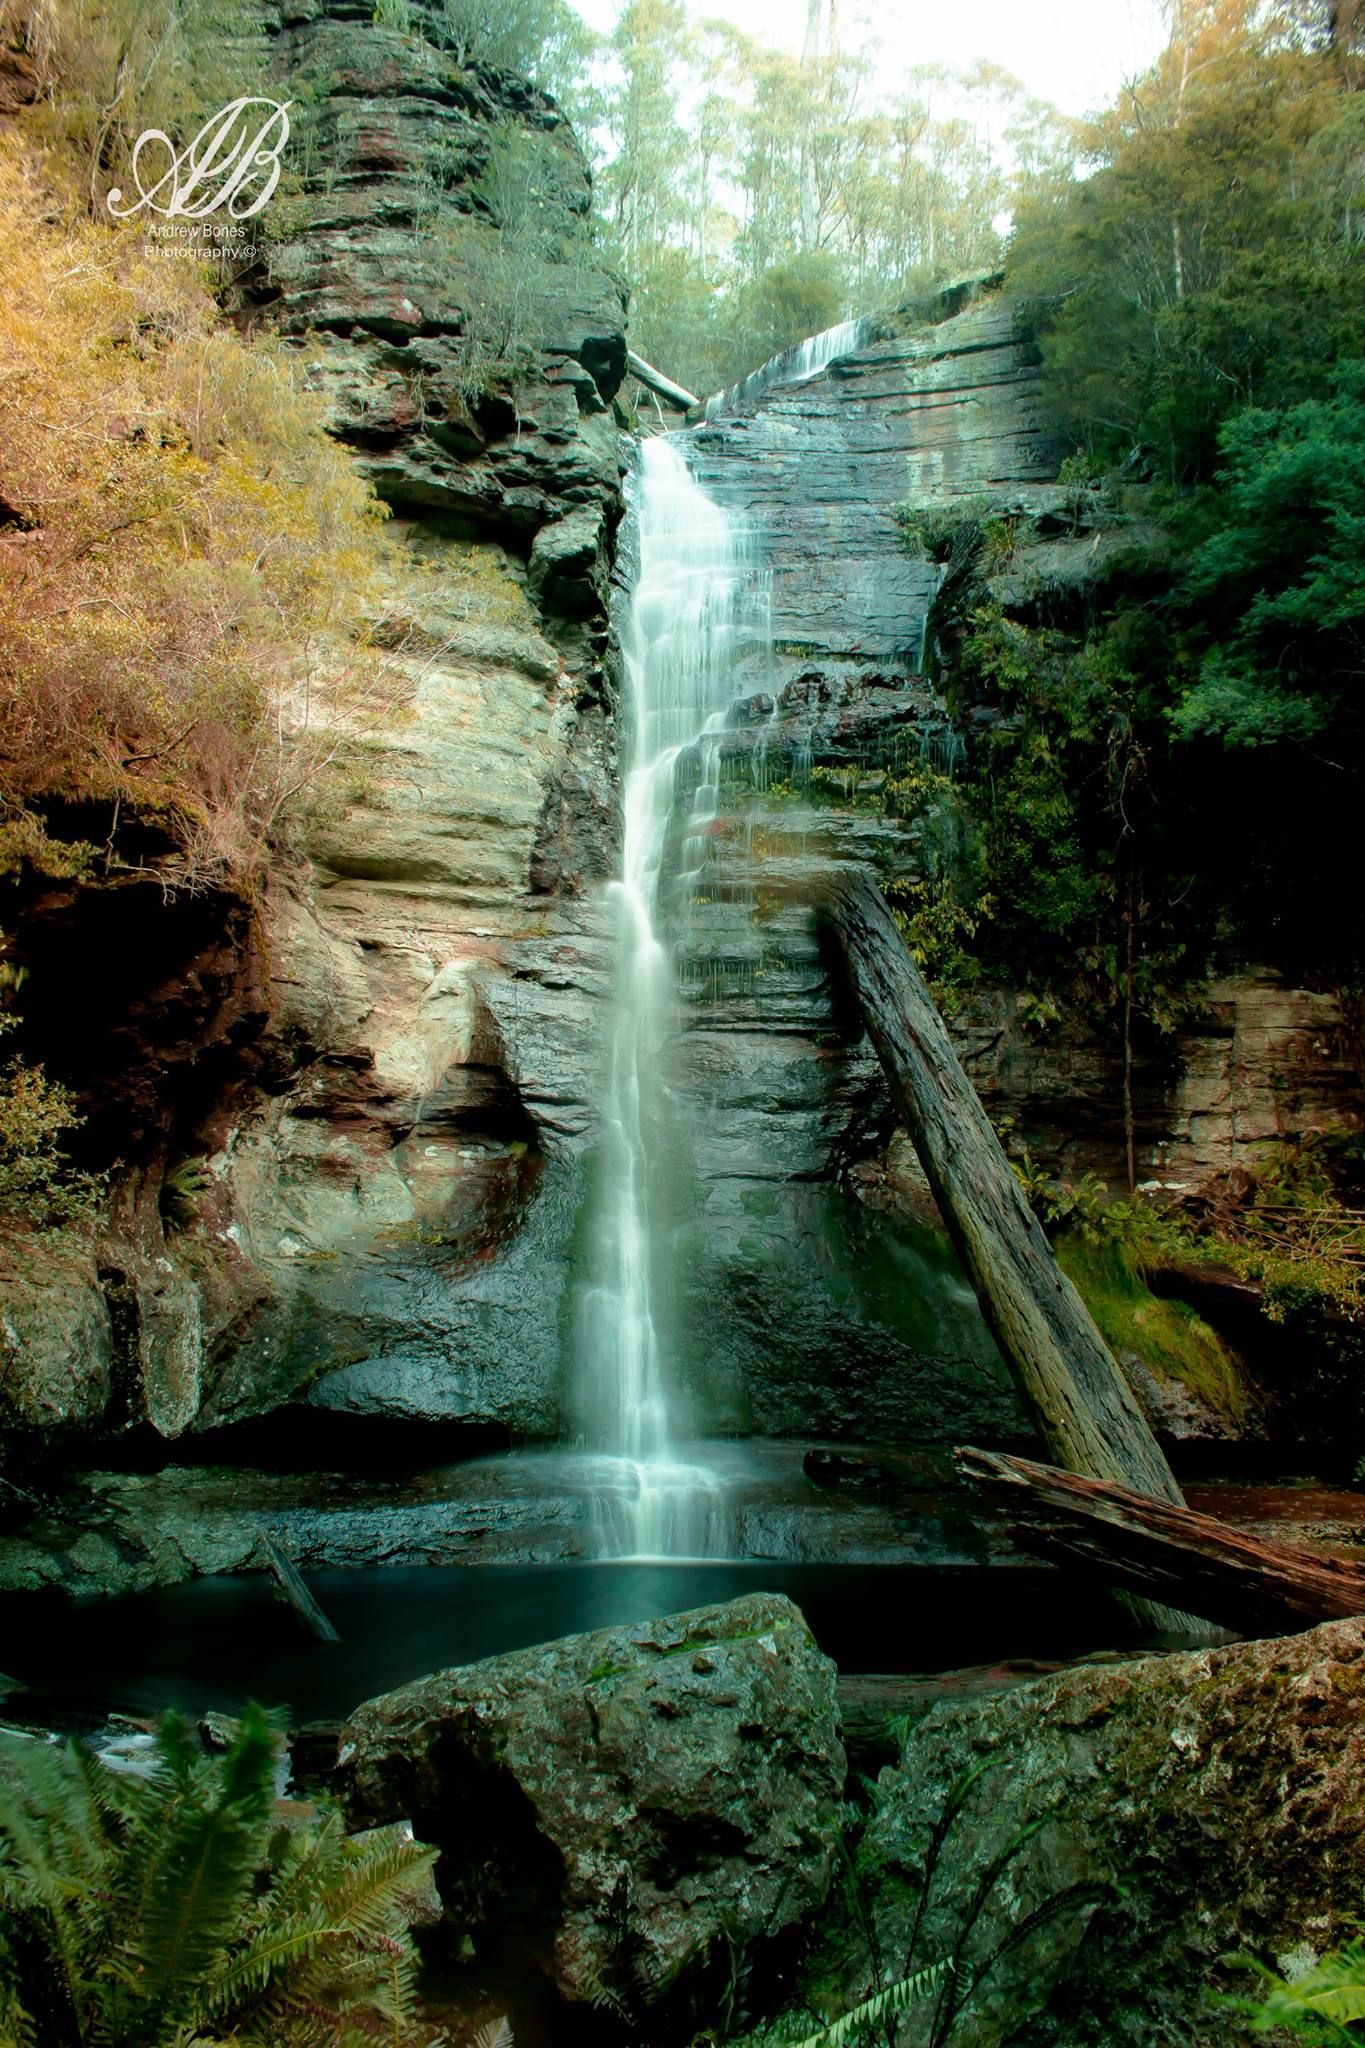 Snug Tier Falls - photo by Andrew Bones